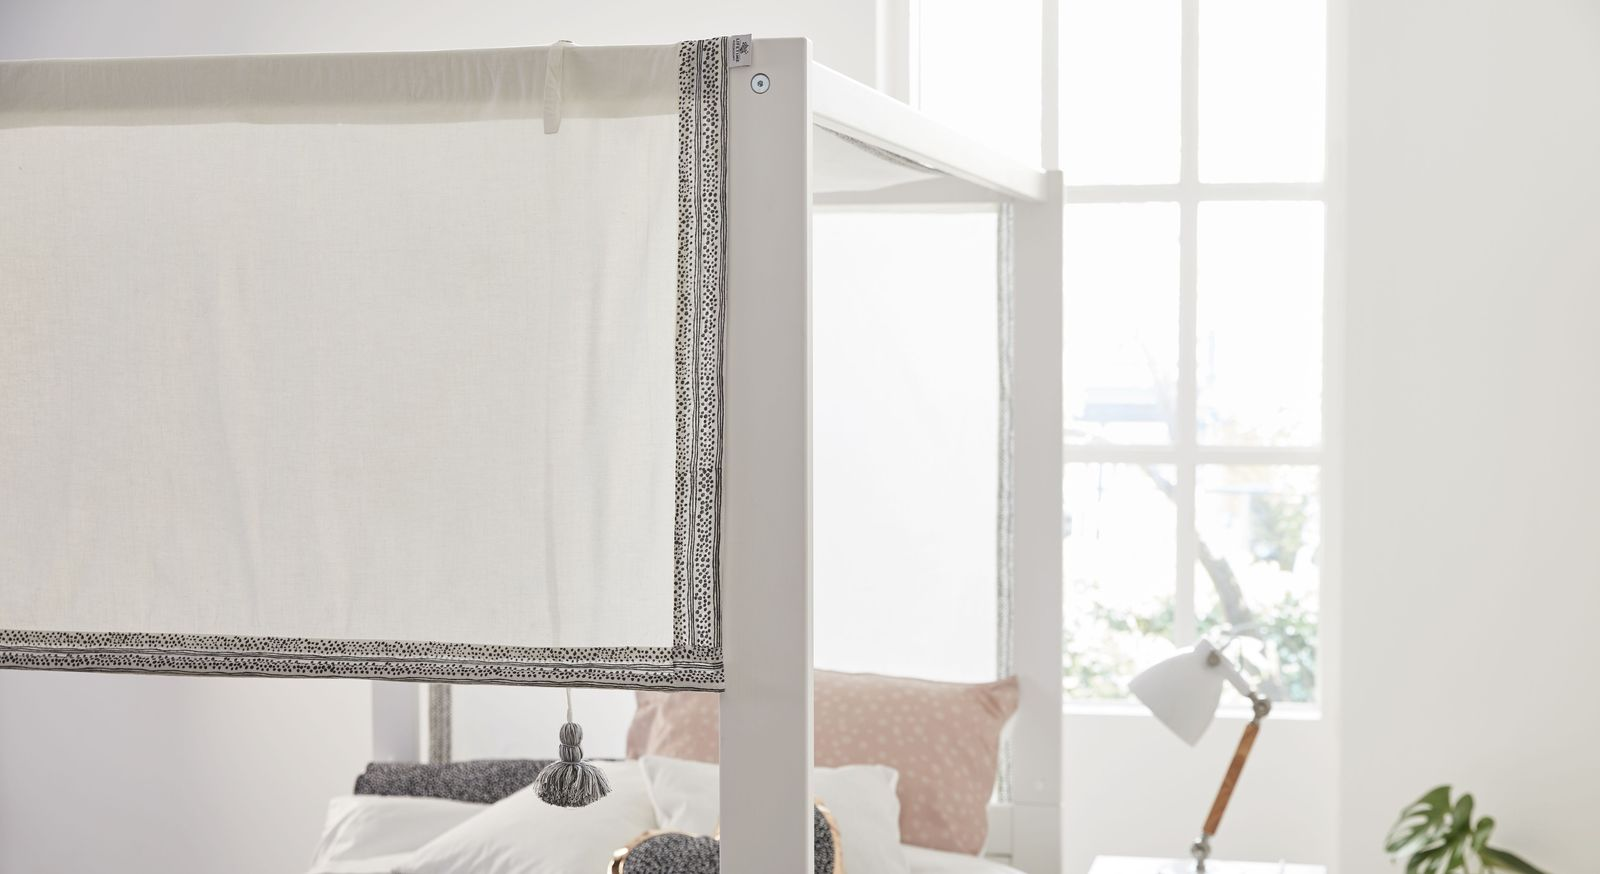 LIFETIME Himmelbett Living Style mit trendigem Baldachin-Stoff